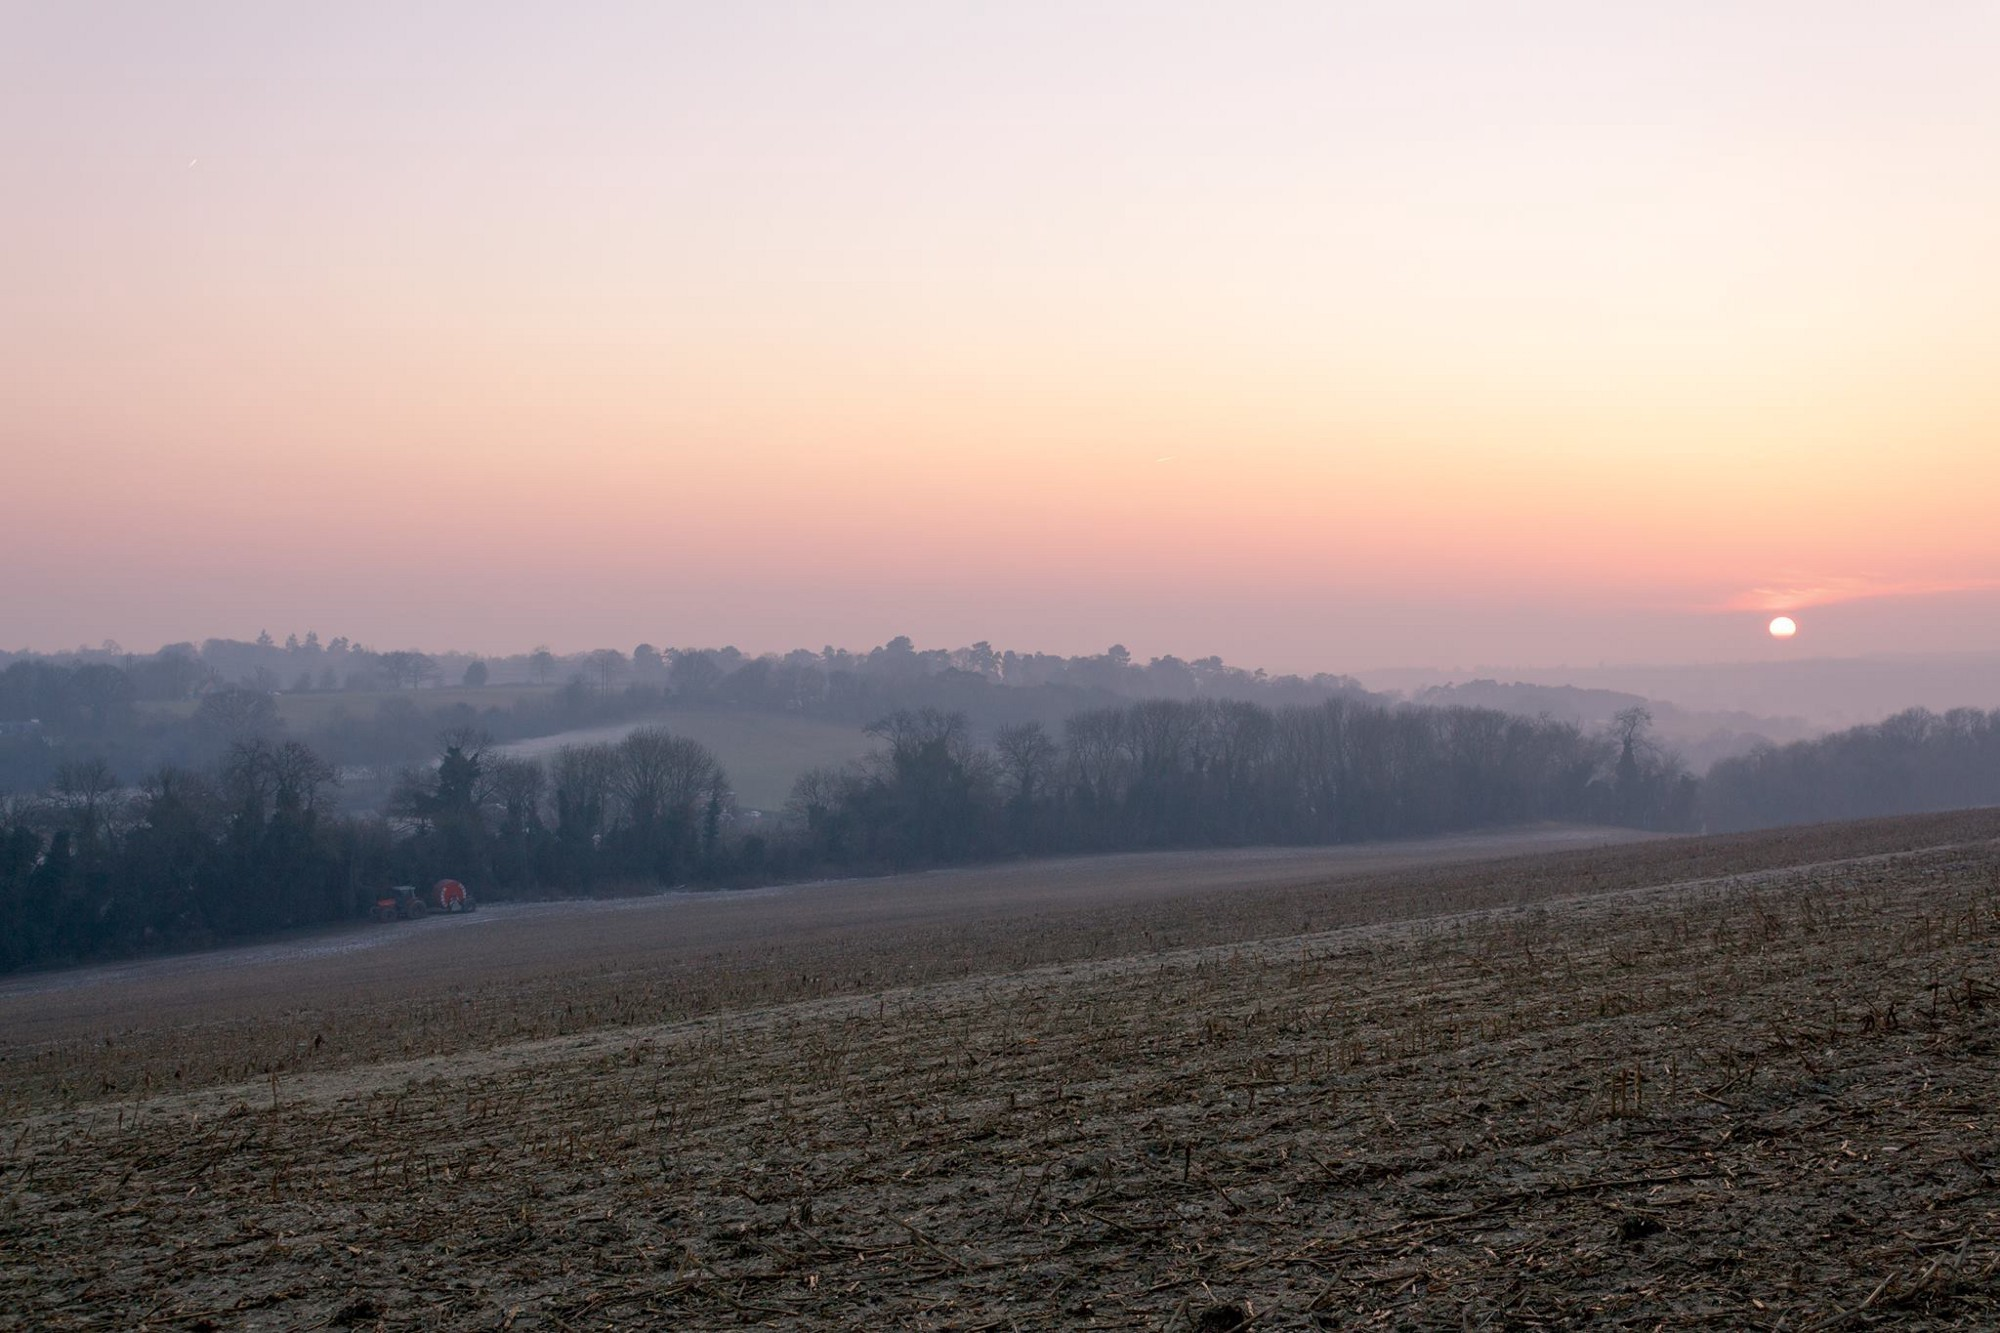 landscapeWalkjpeg